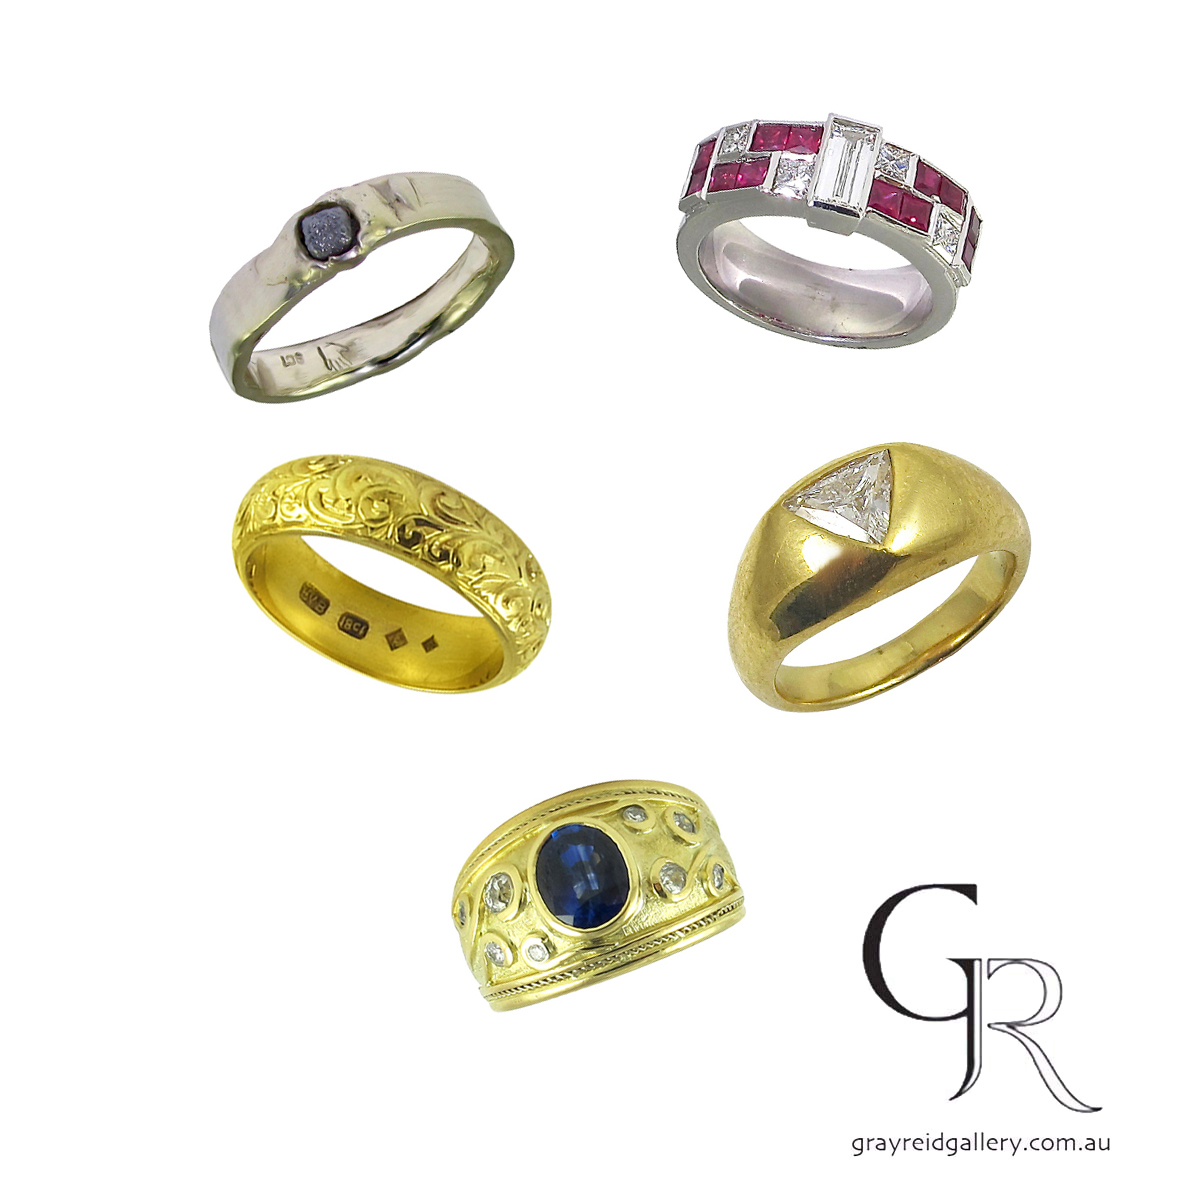 Selection of bespoke mens engagement rings at Gray Reid Gallery.